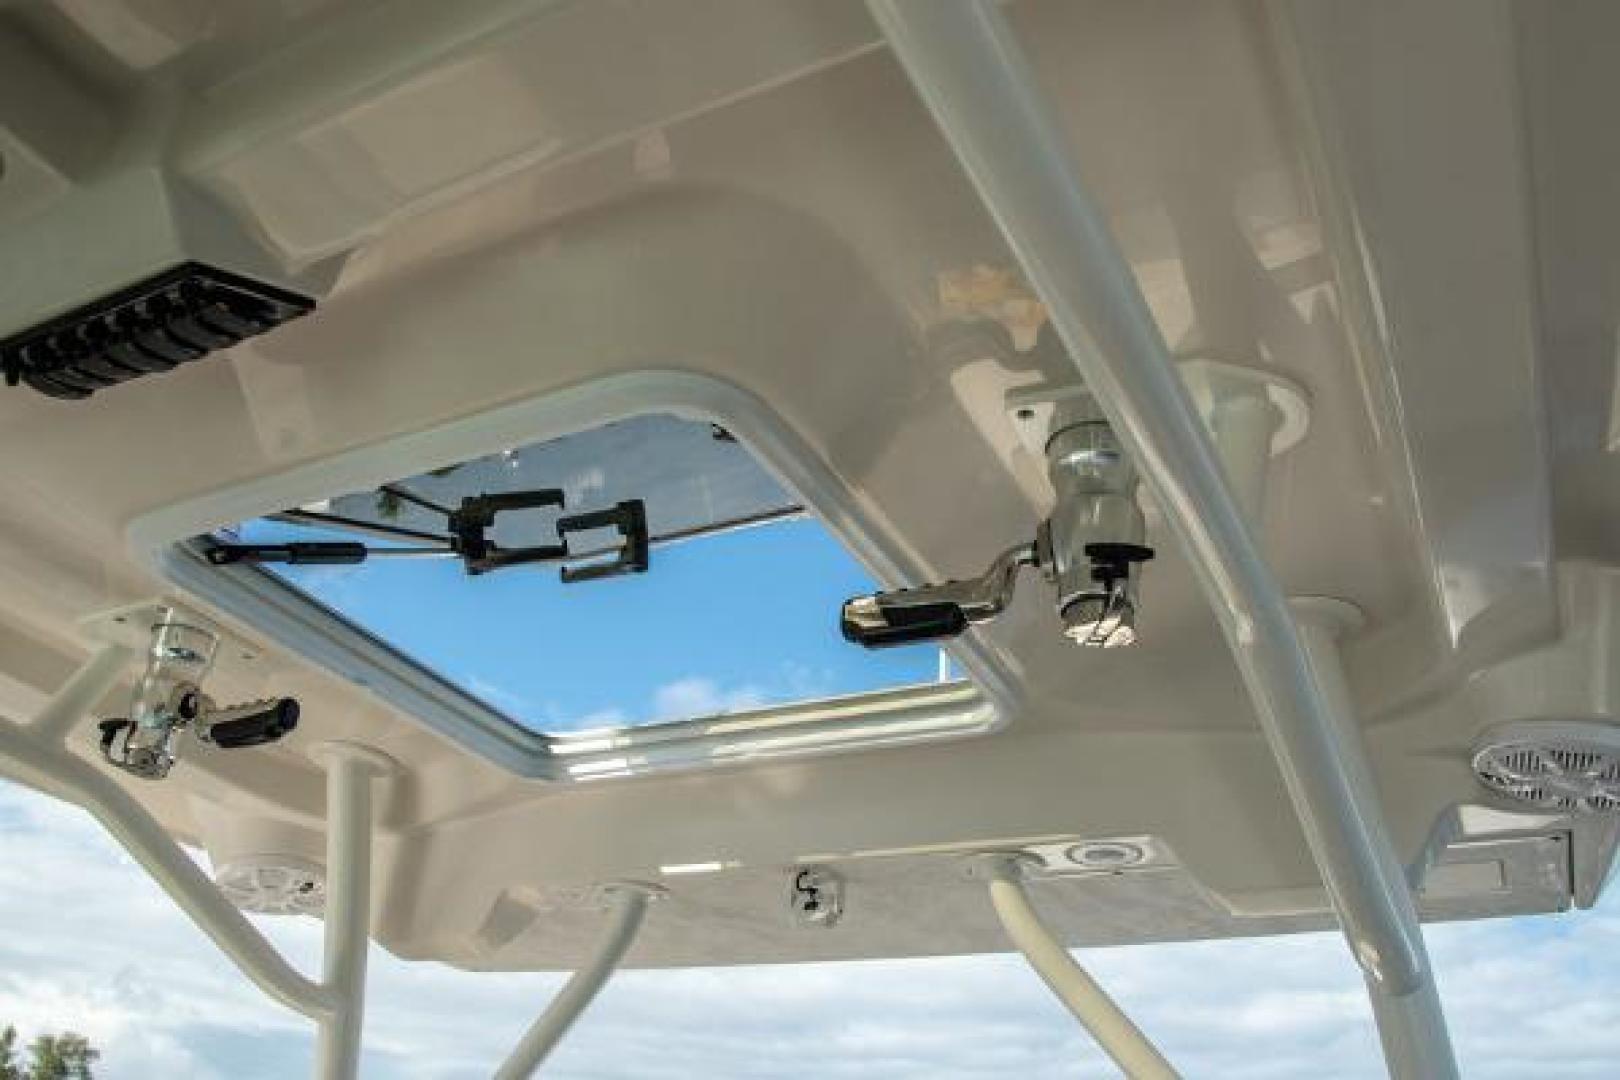 Sailfish-360 CC 2021-Sailfish 360 CC Fort Lauderdale-Florida-United States-Manufacturer Provided Image-1524510 | Thumbnail